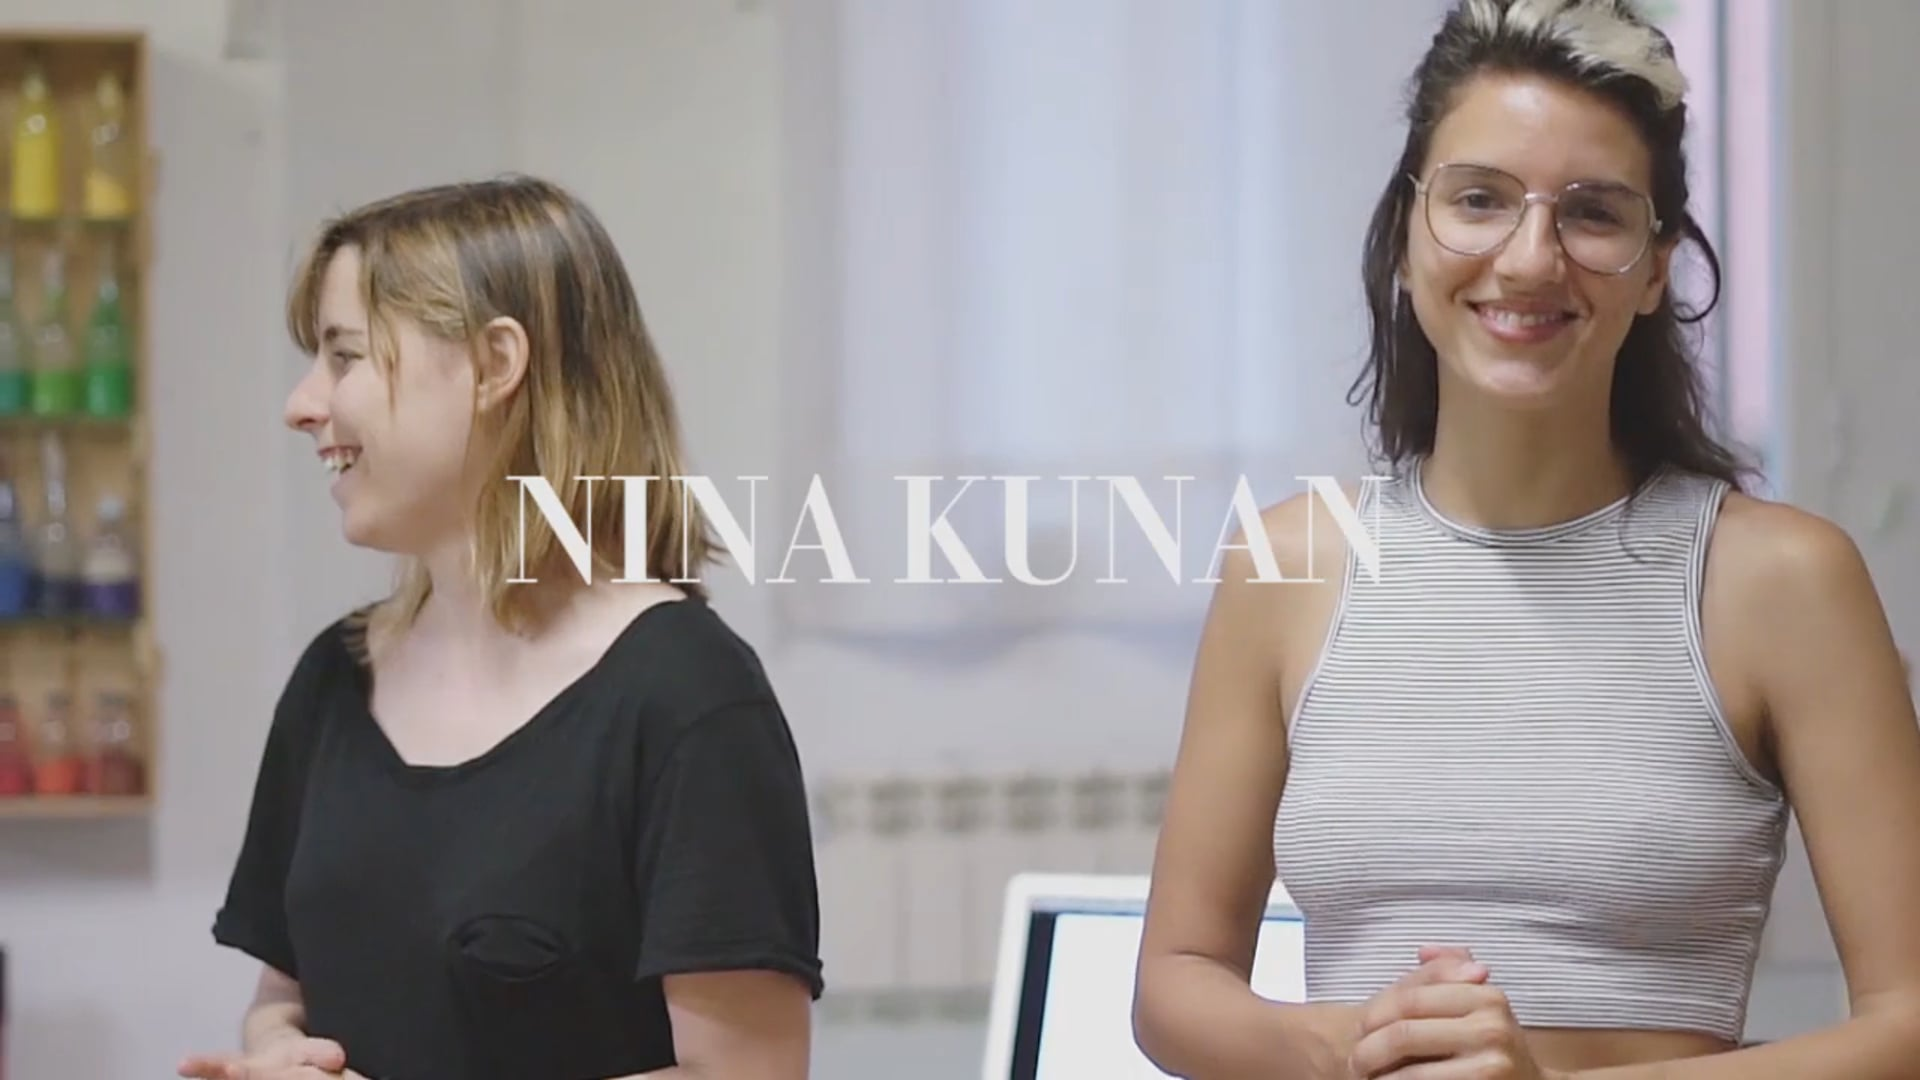 Residencia Artística R.A.R.O Madrid - Nina Kunan (Julio 2017)